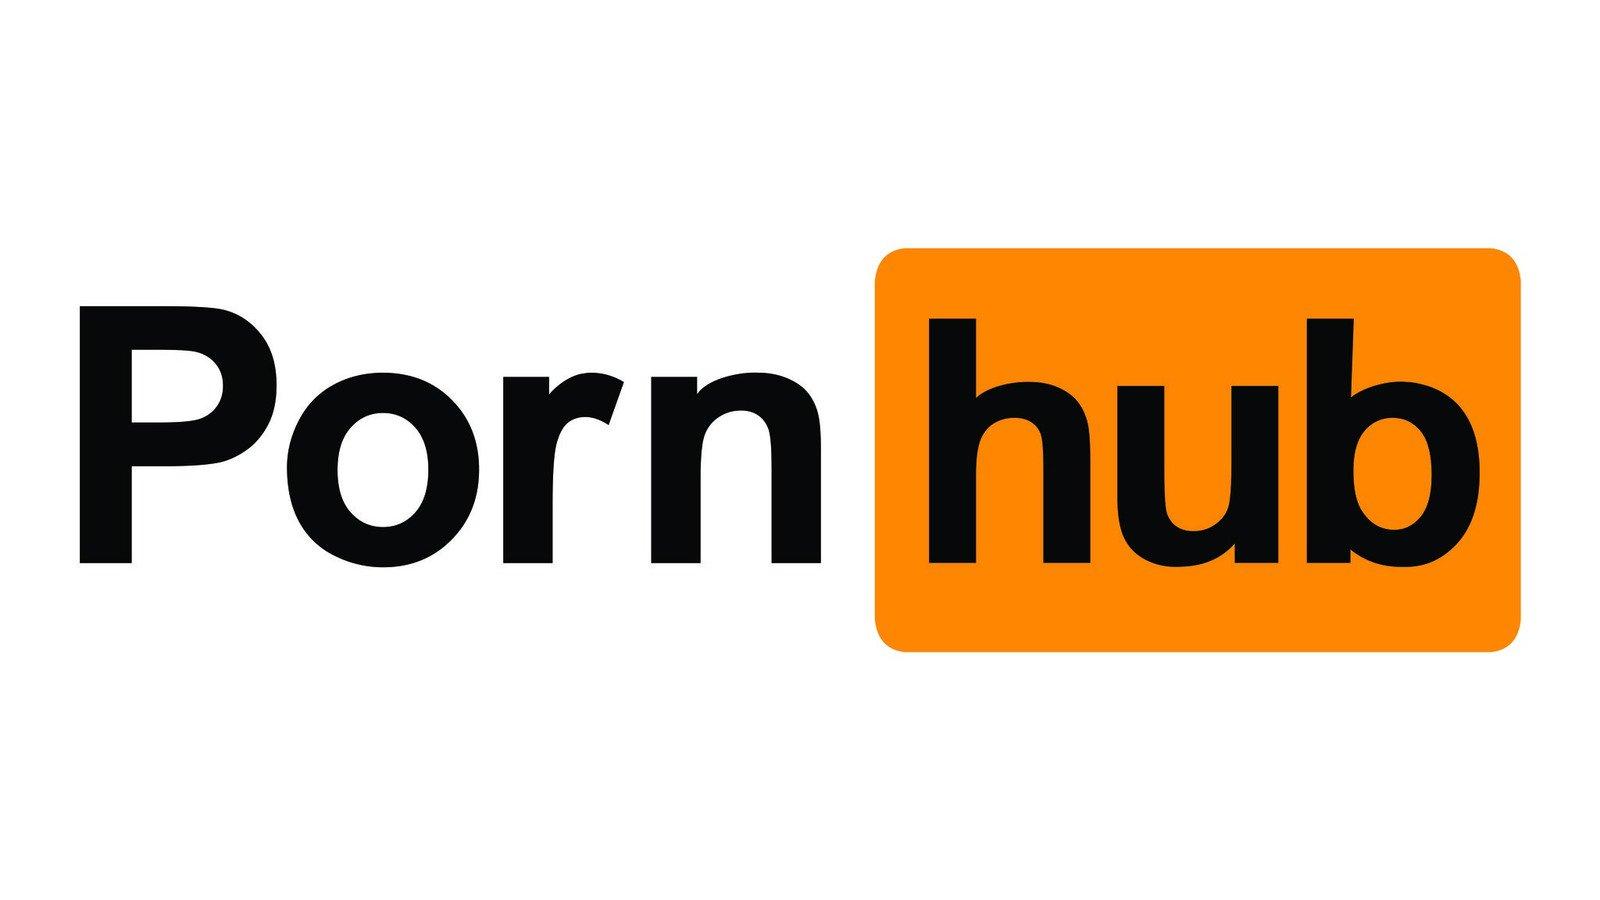 Pornhud video #10